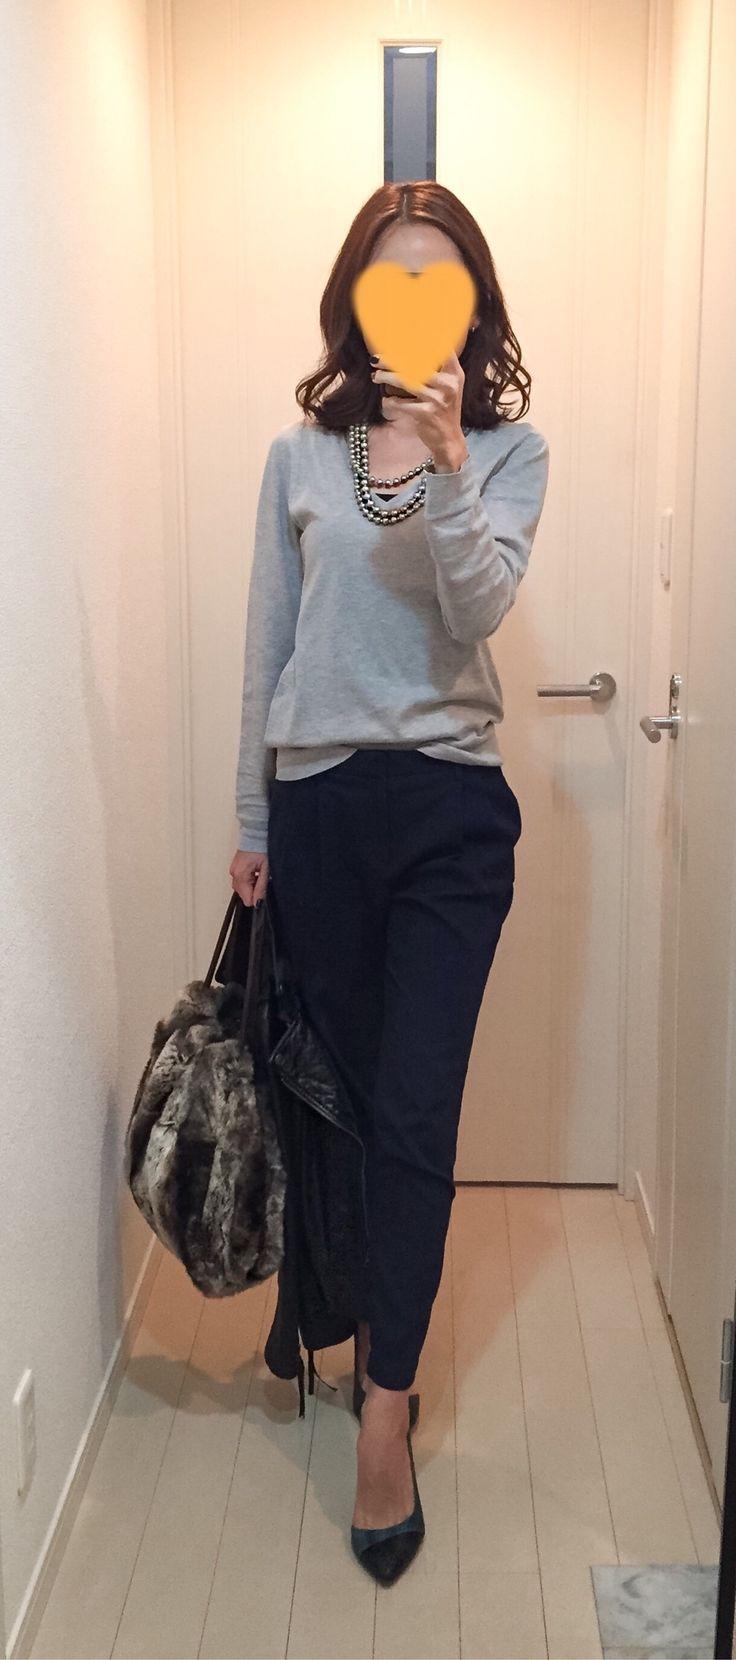 Grey knit: SHIPS, Navy pants: Des Pres, Leather jacket: IENA, Fur bag: Tomorrowland, Green pumps: COLE HANN